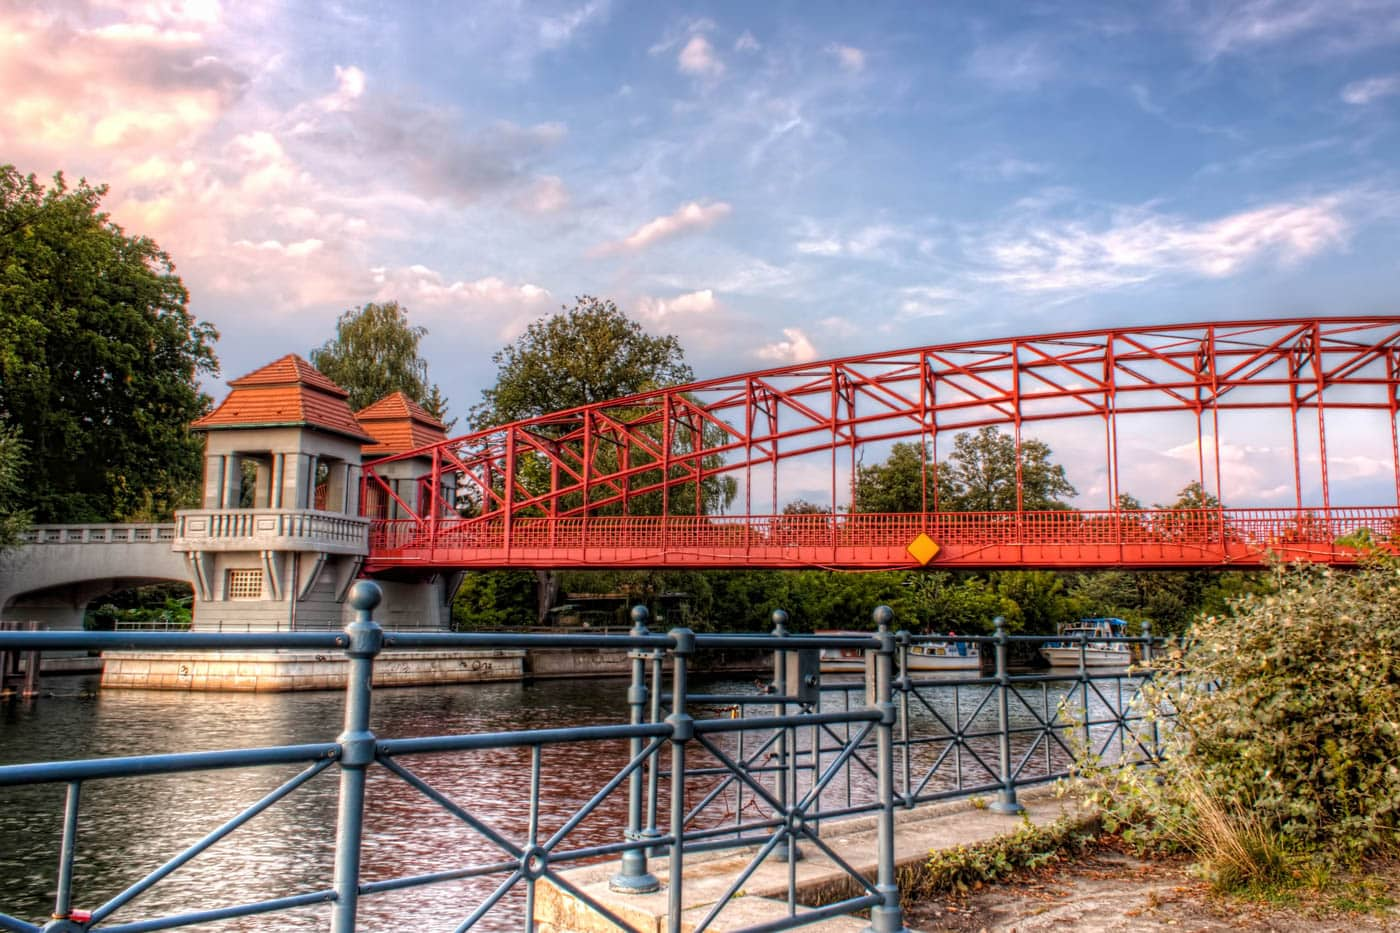 Bridge Sechserbrücke, Tegel in Germany